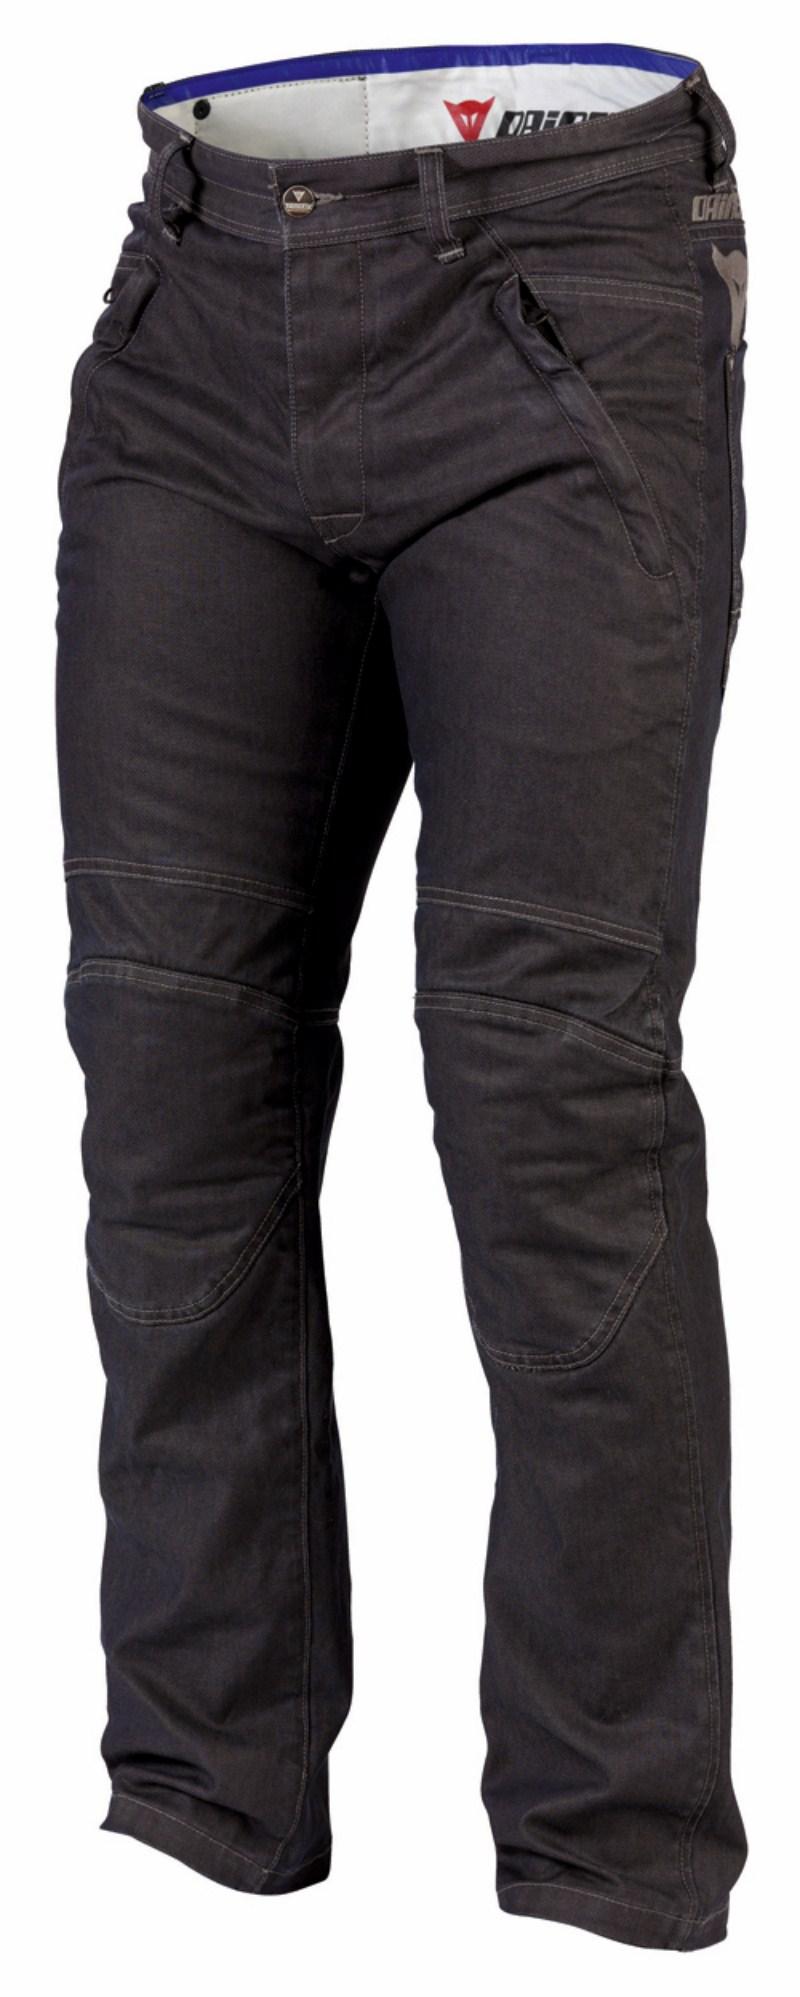 Pantaloni denim jeans Dainese D4 Brace antracite